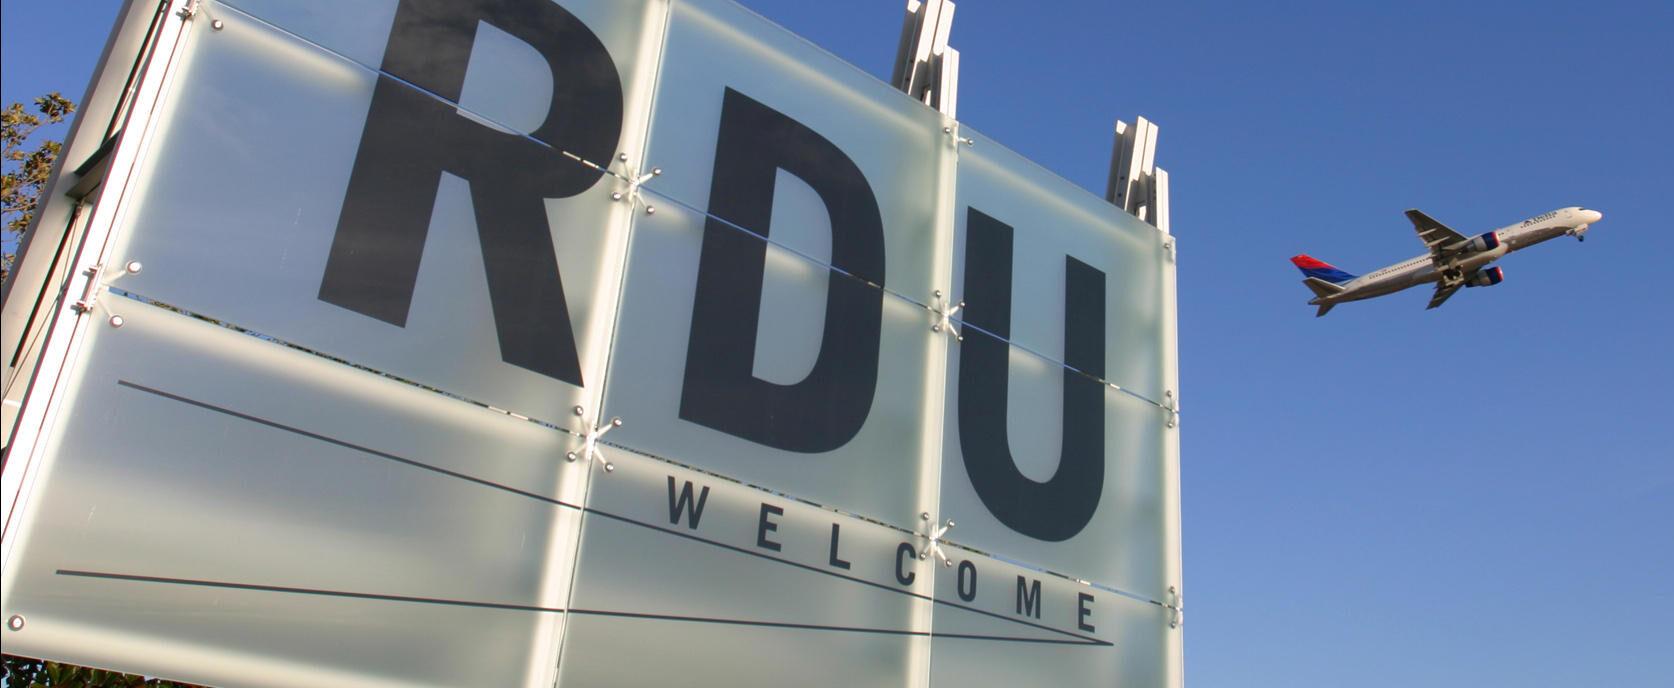 Raleigh Durham International Airport RDU